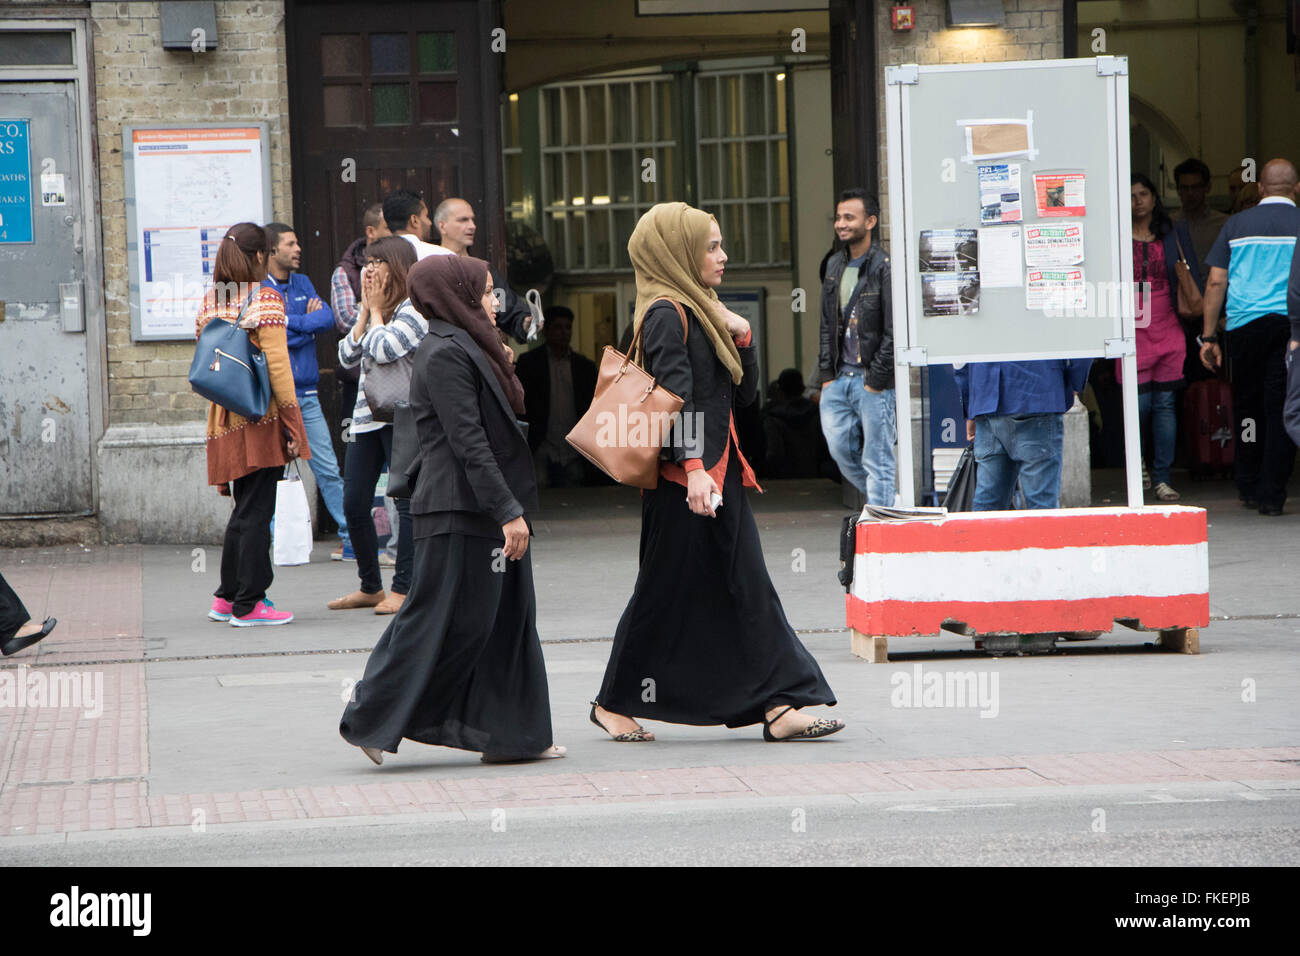 muslim women headscarf immigration migration - Stock Image